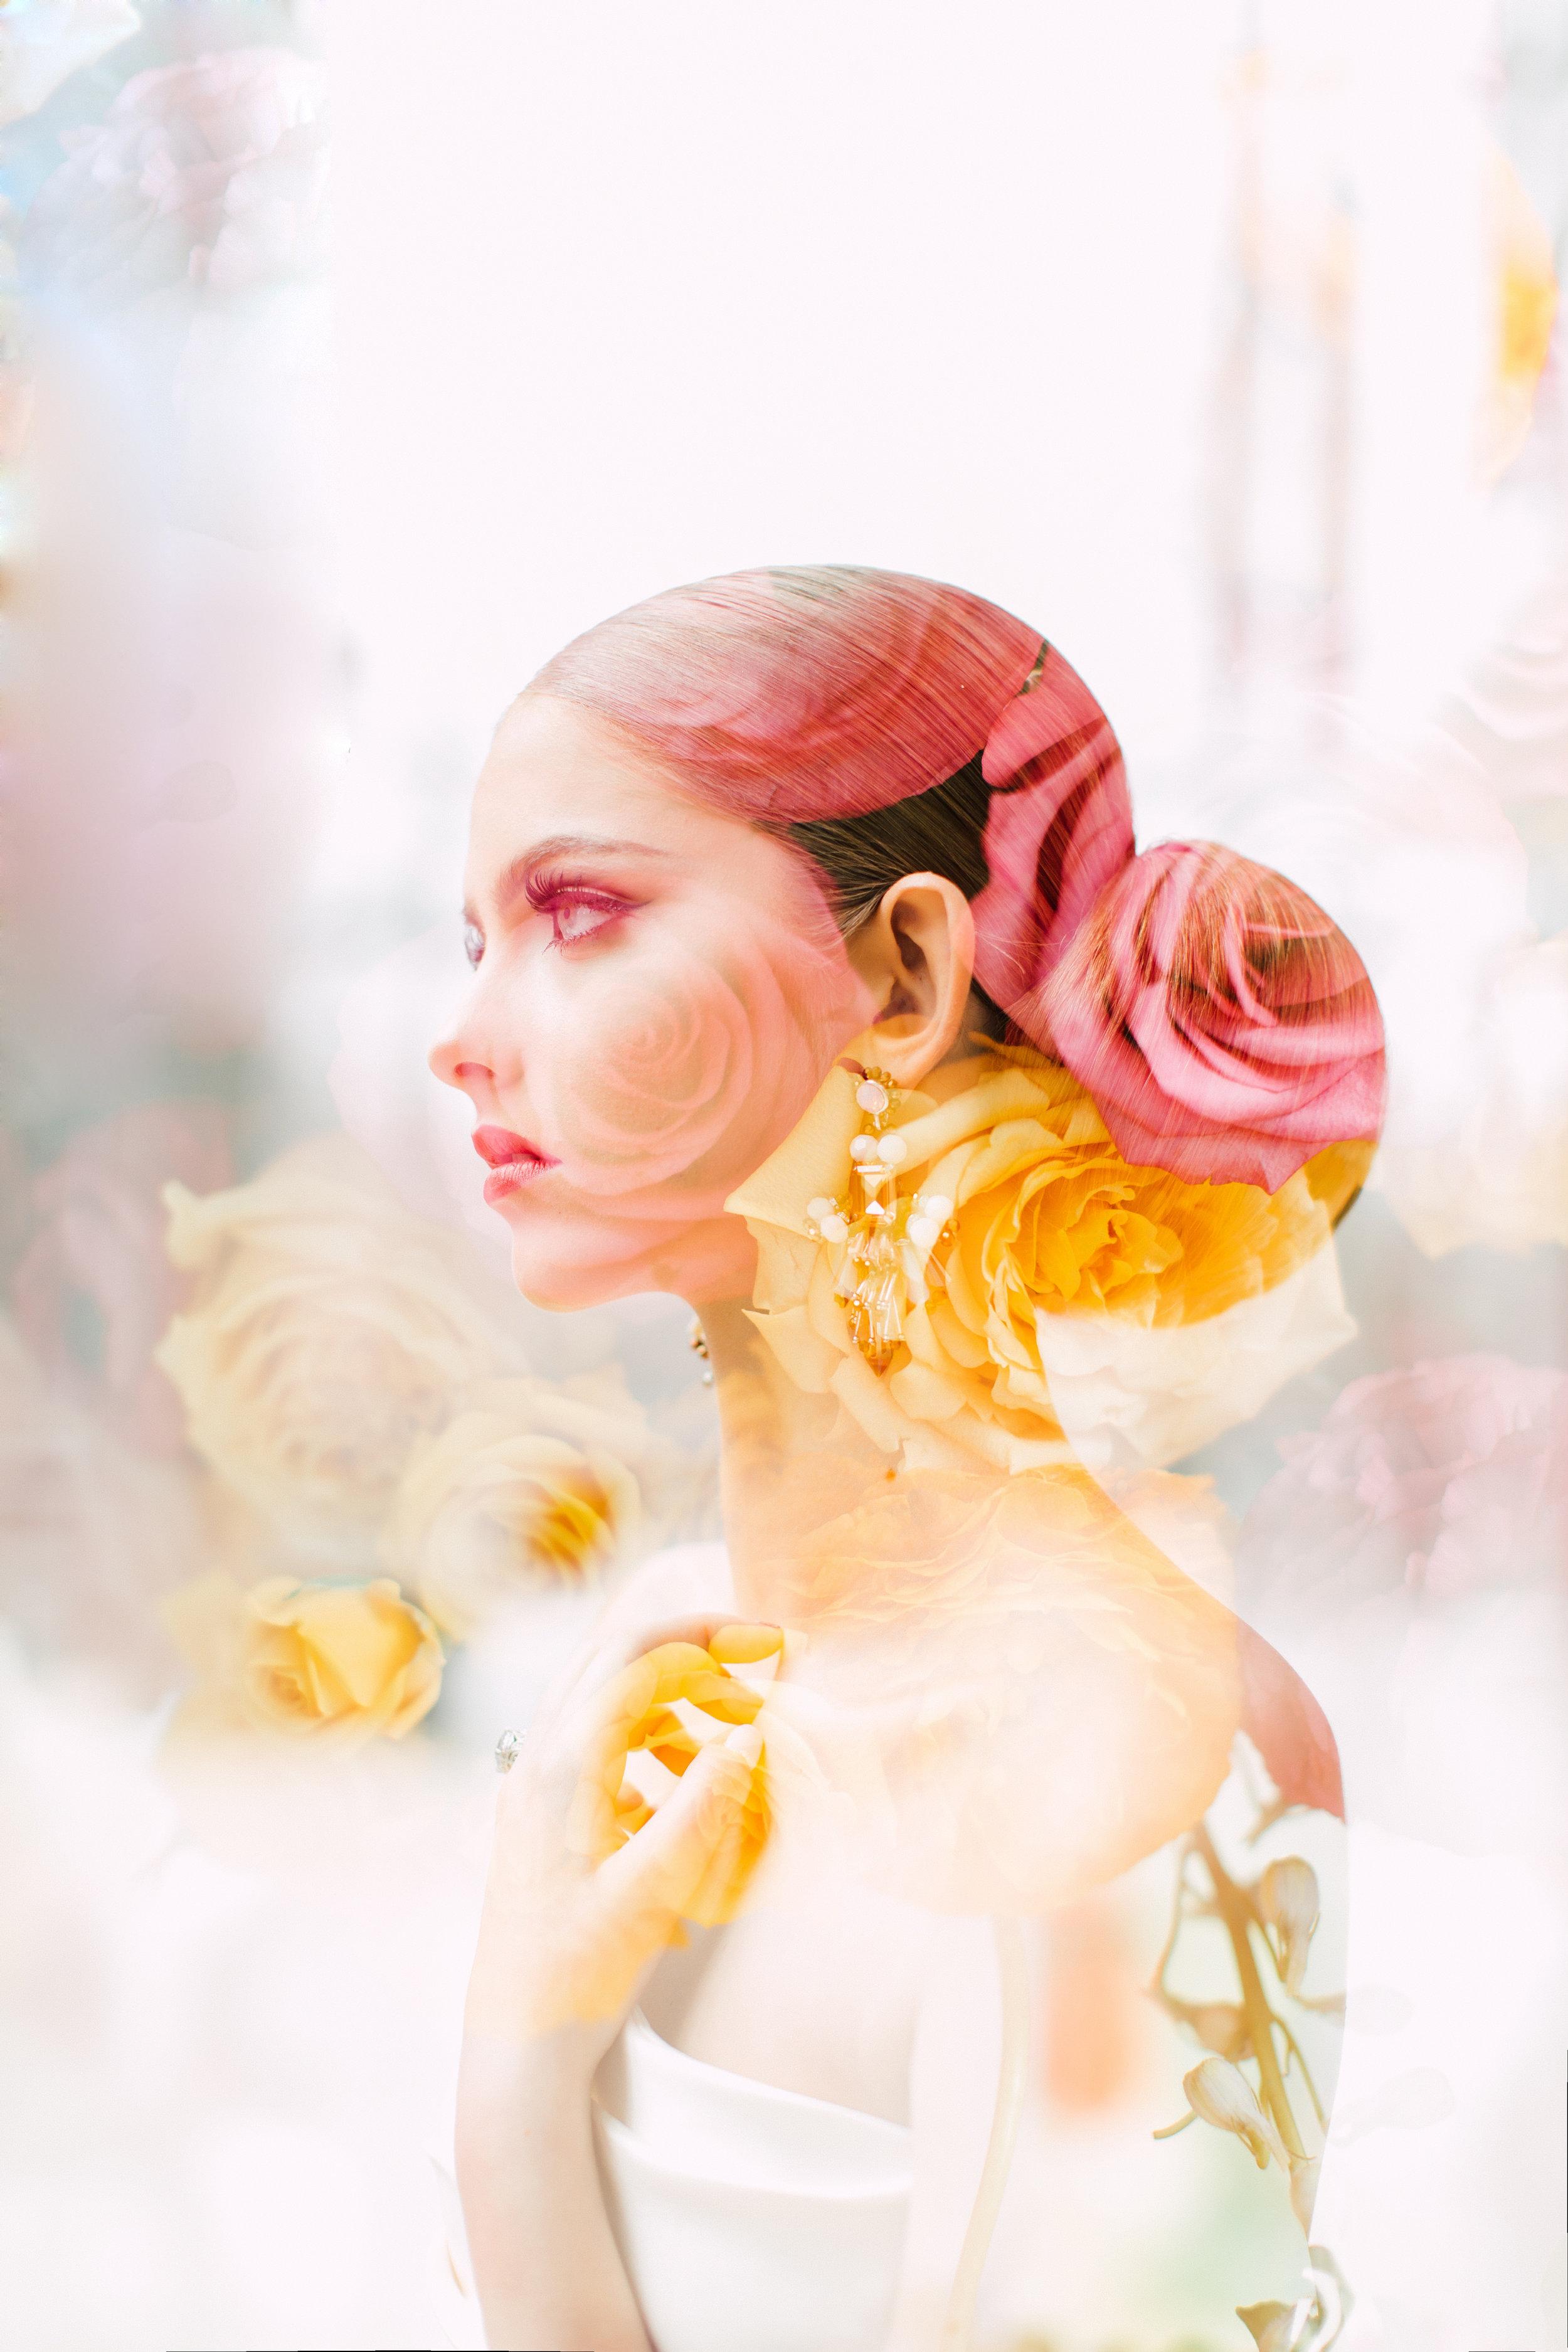 August In Bloom - Beauty Juxtaposition - Dreaming of Oscar